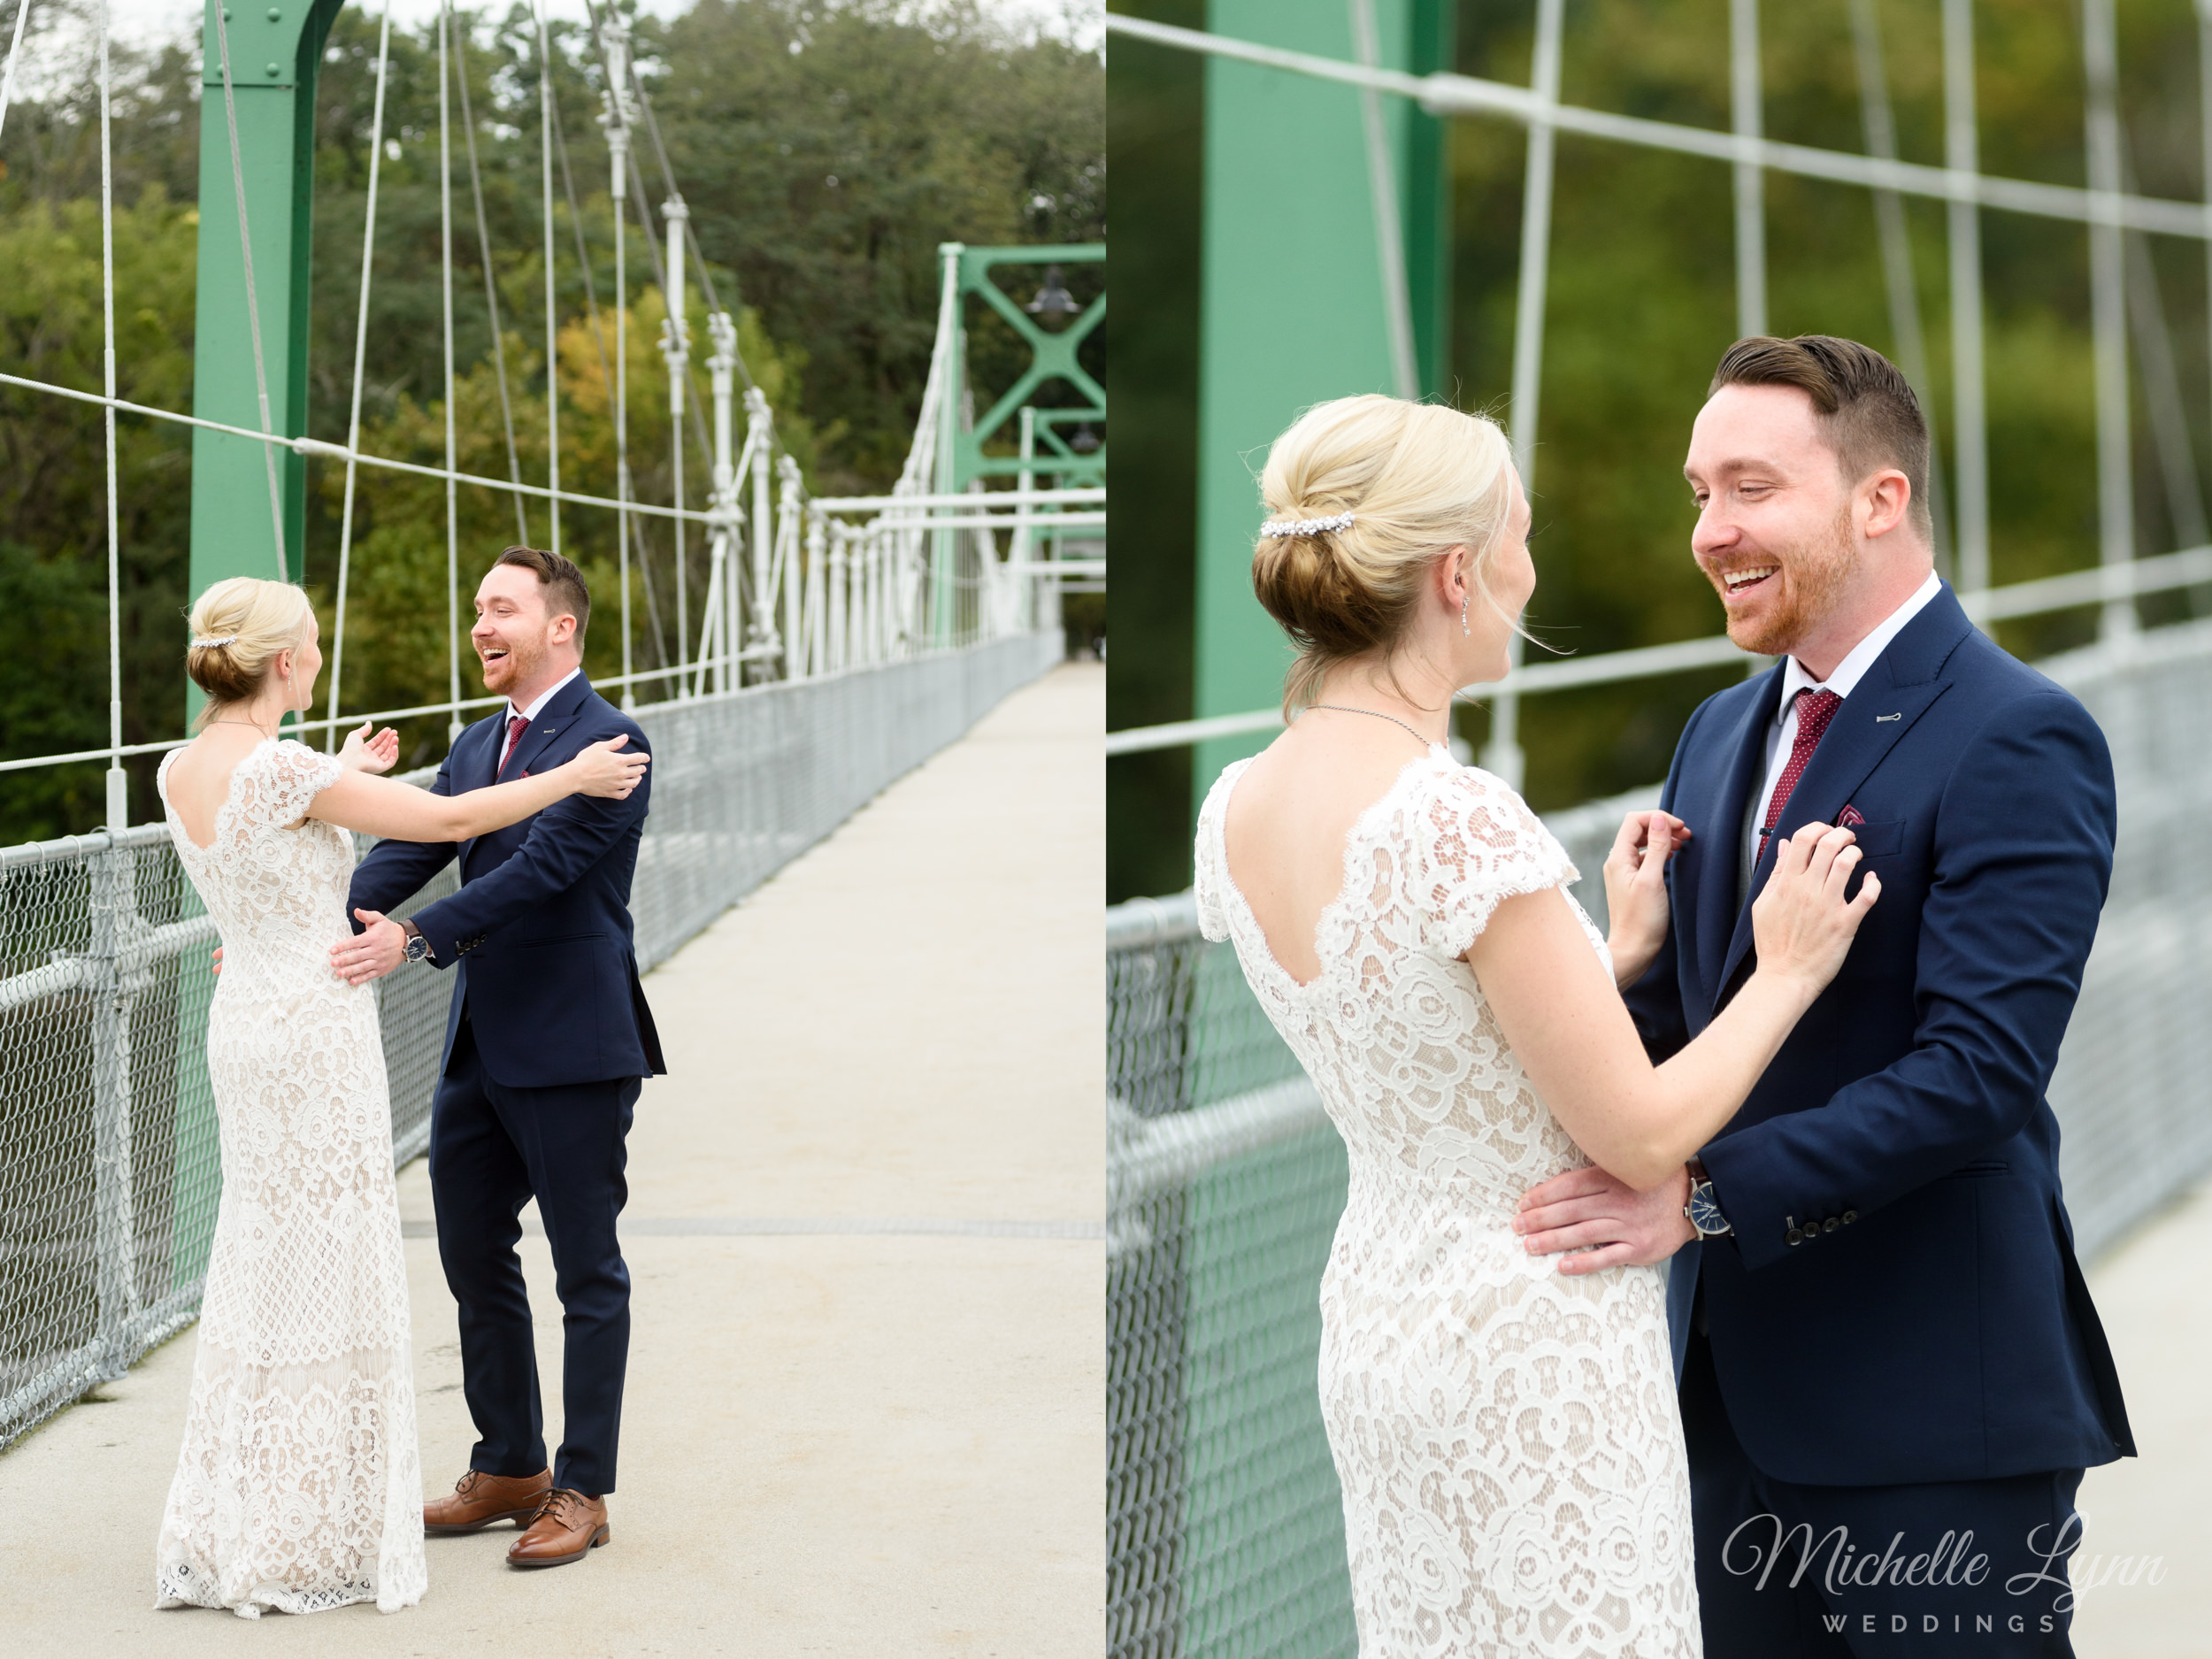 mlw-lumberville-general-store-new-hope-wedding-photographer-9.jpg